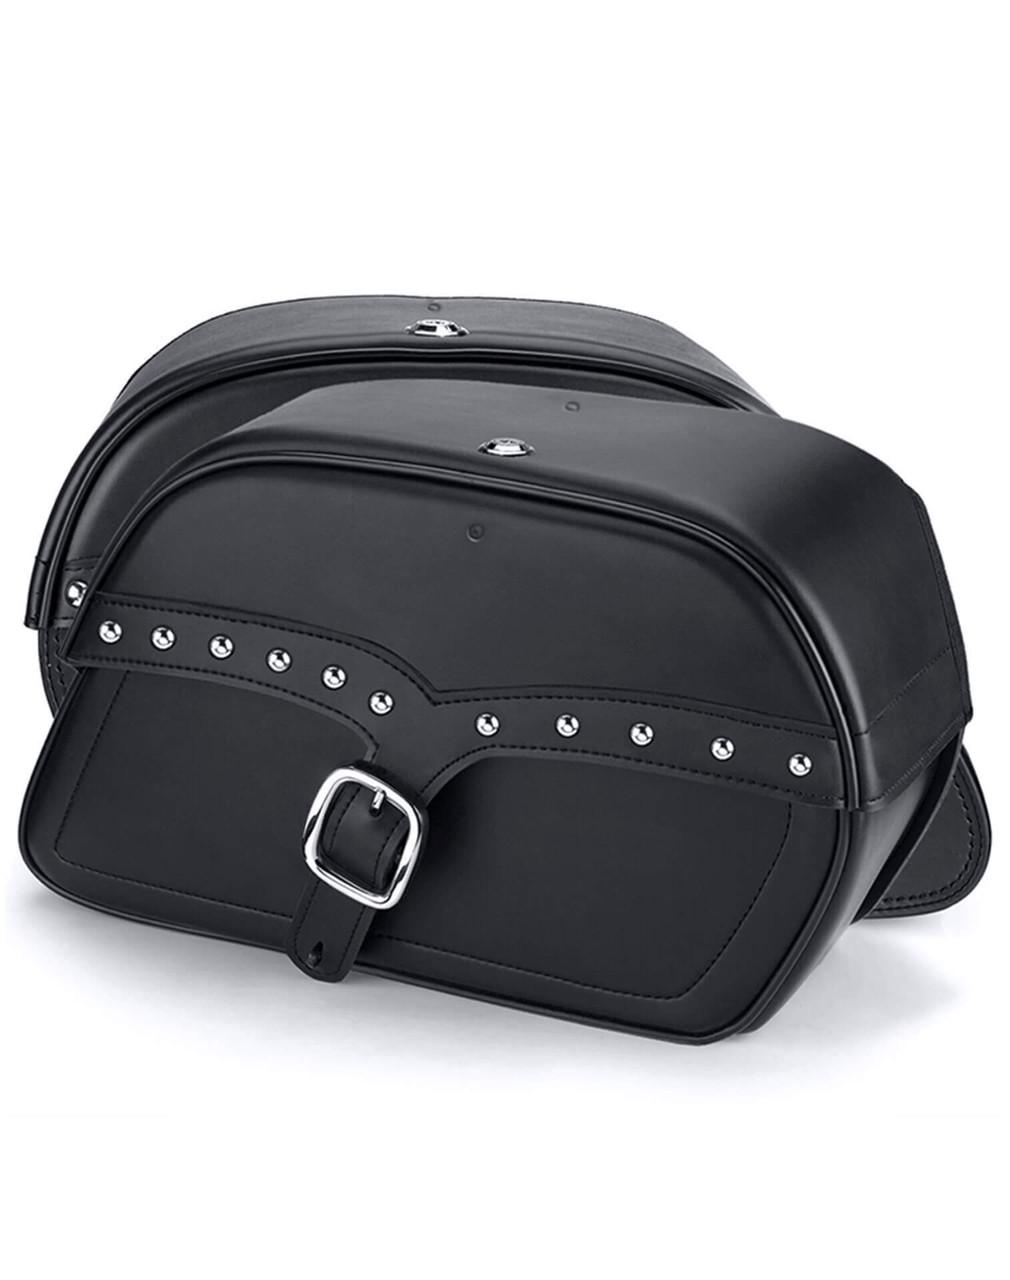 Kawasaki Vulcan S ABS Cafe Charger Single Strap Studded Medium Motorcycle Saddlebags Both Bags View